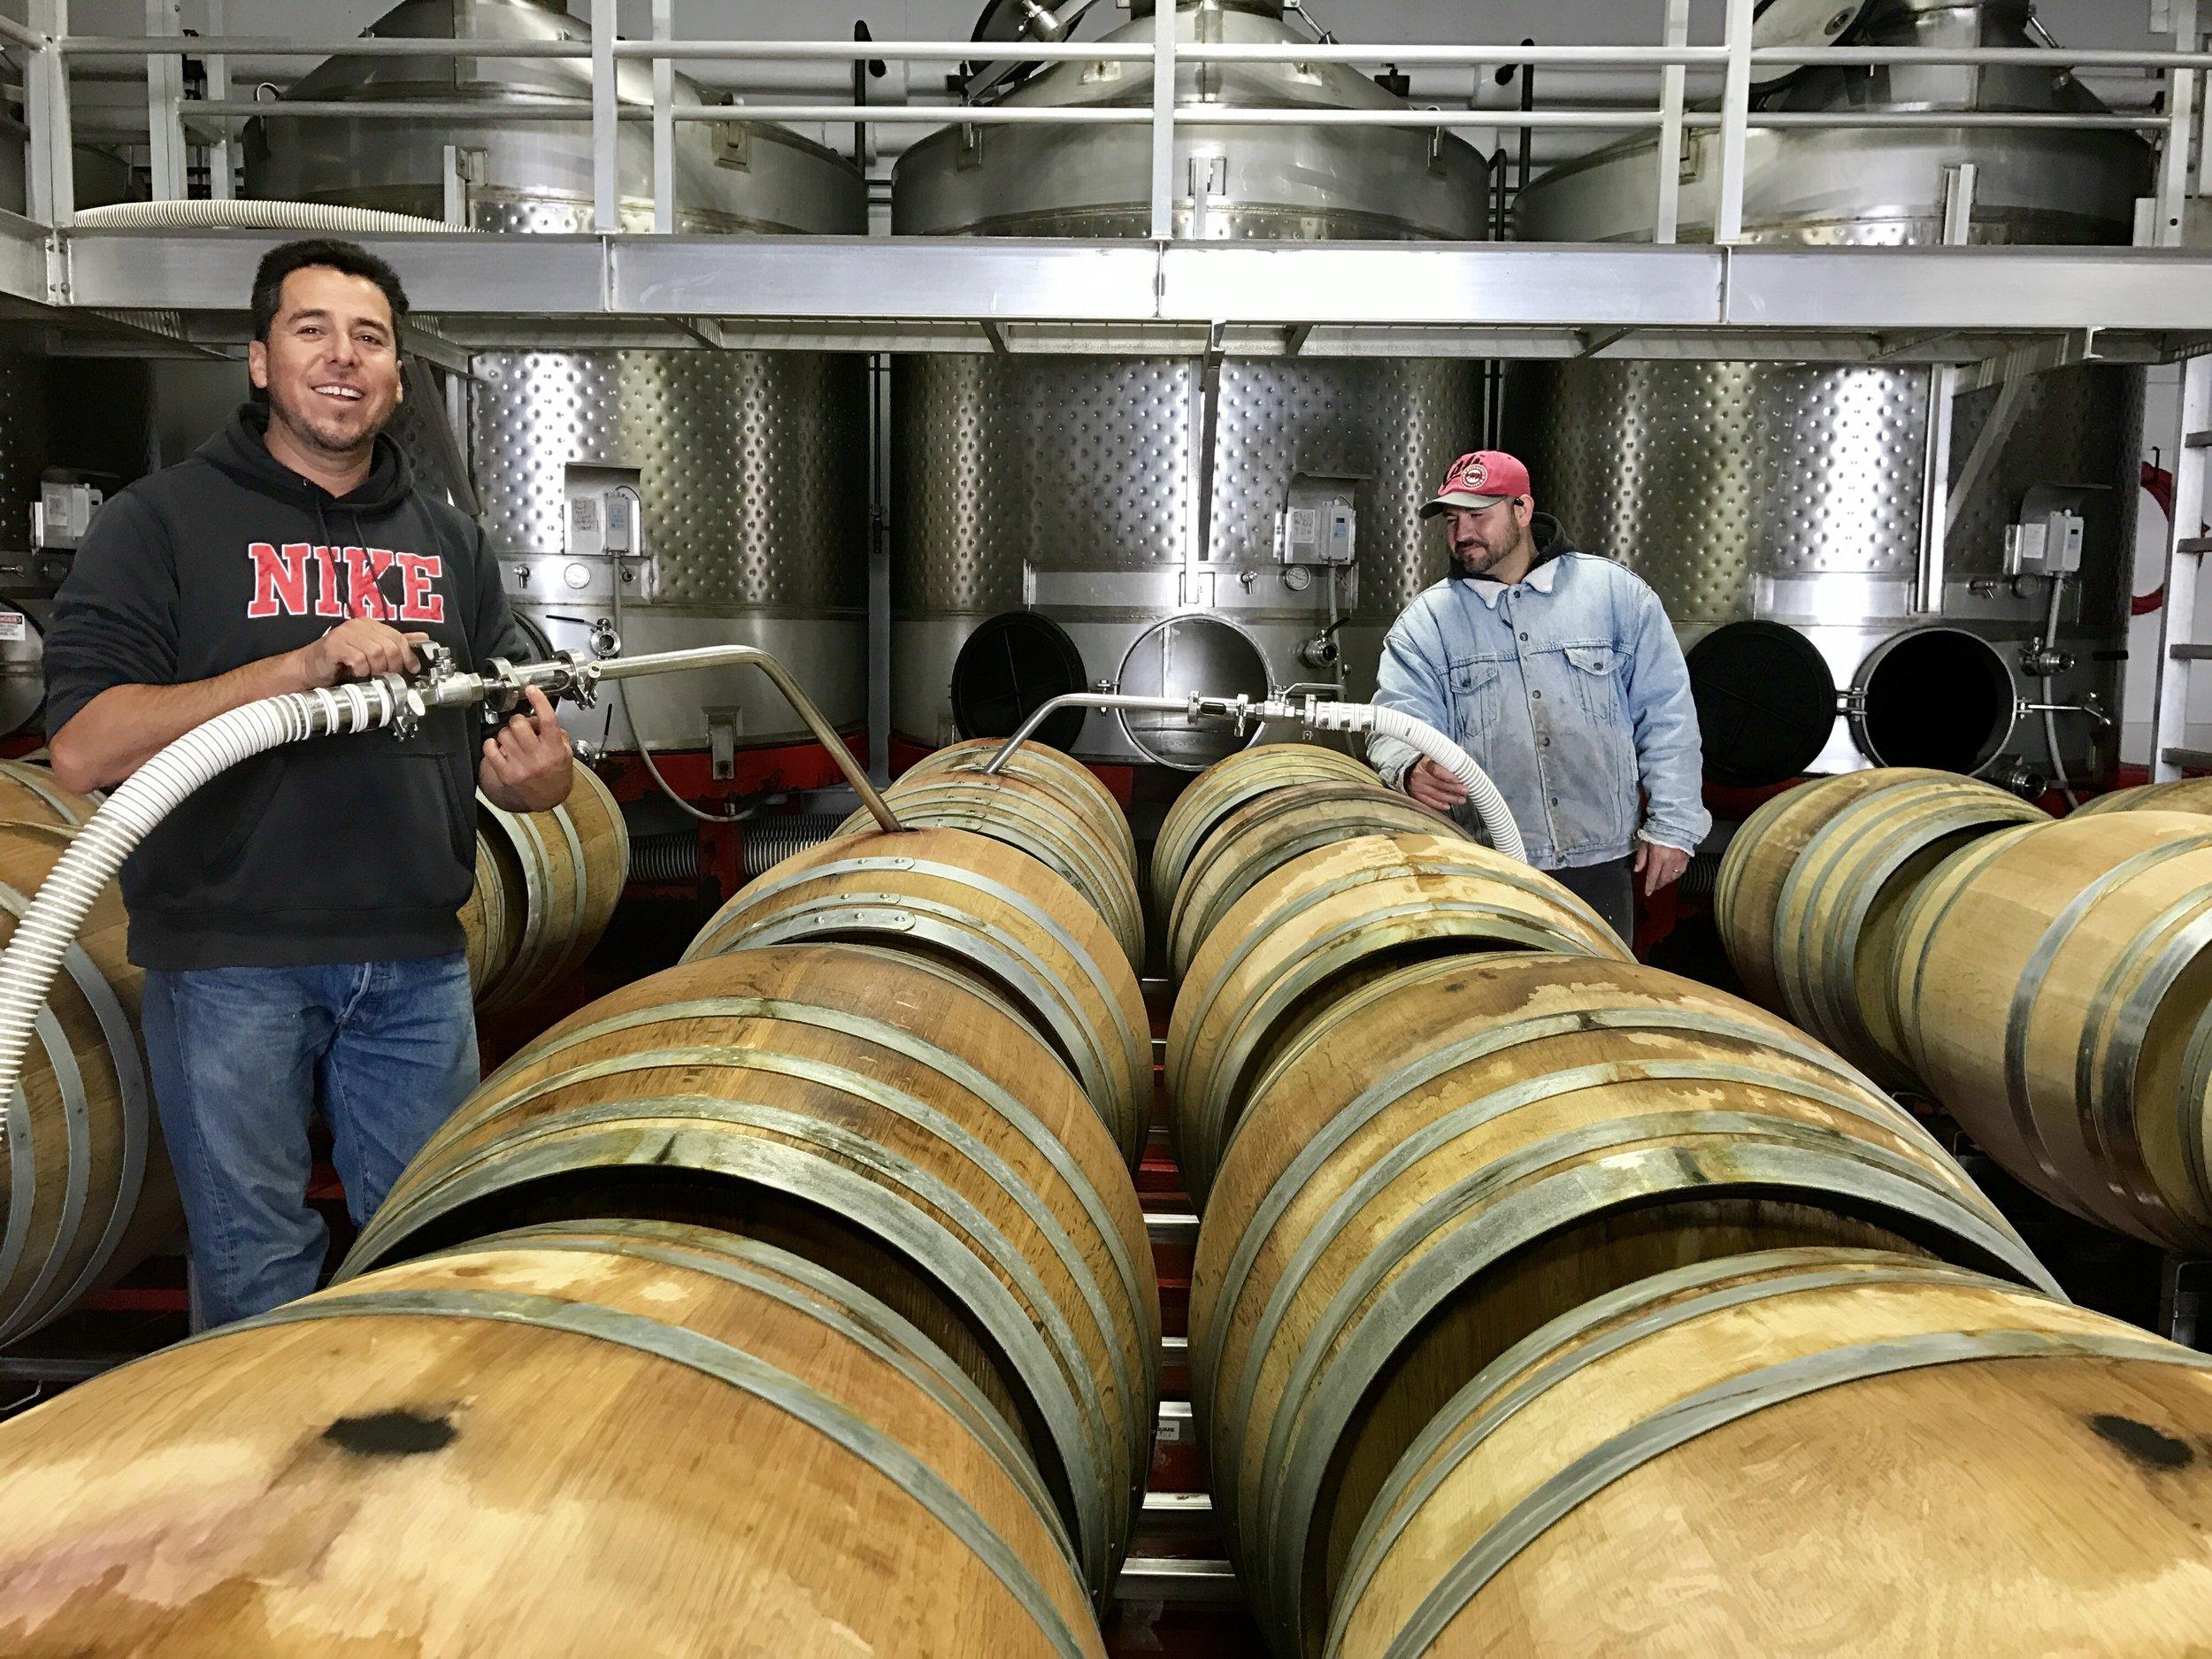 Pesenti winery at work.jpg